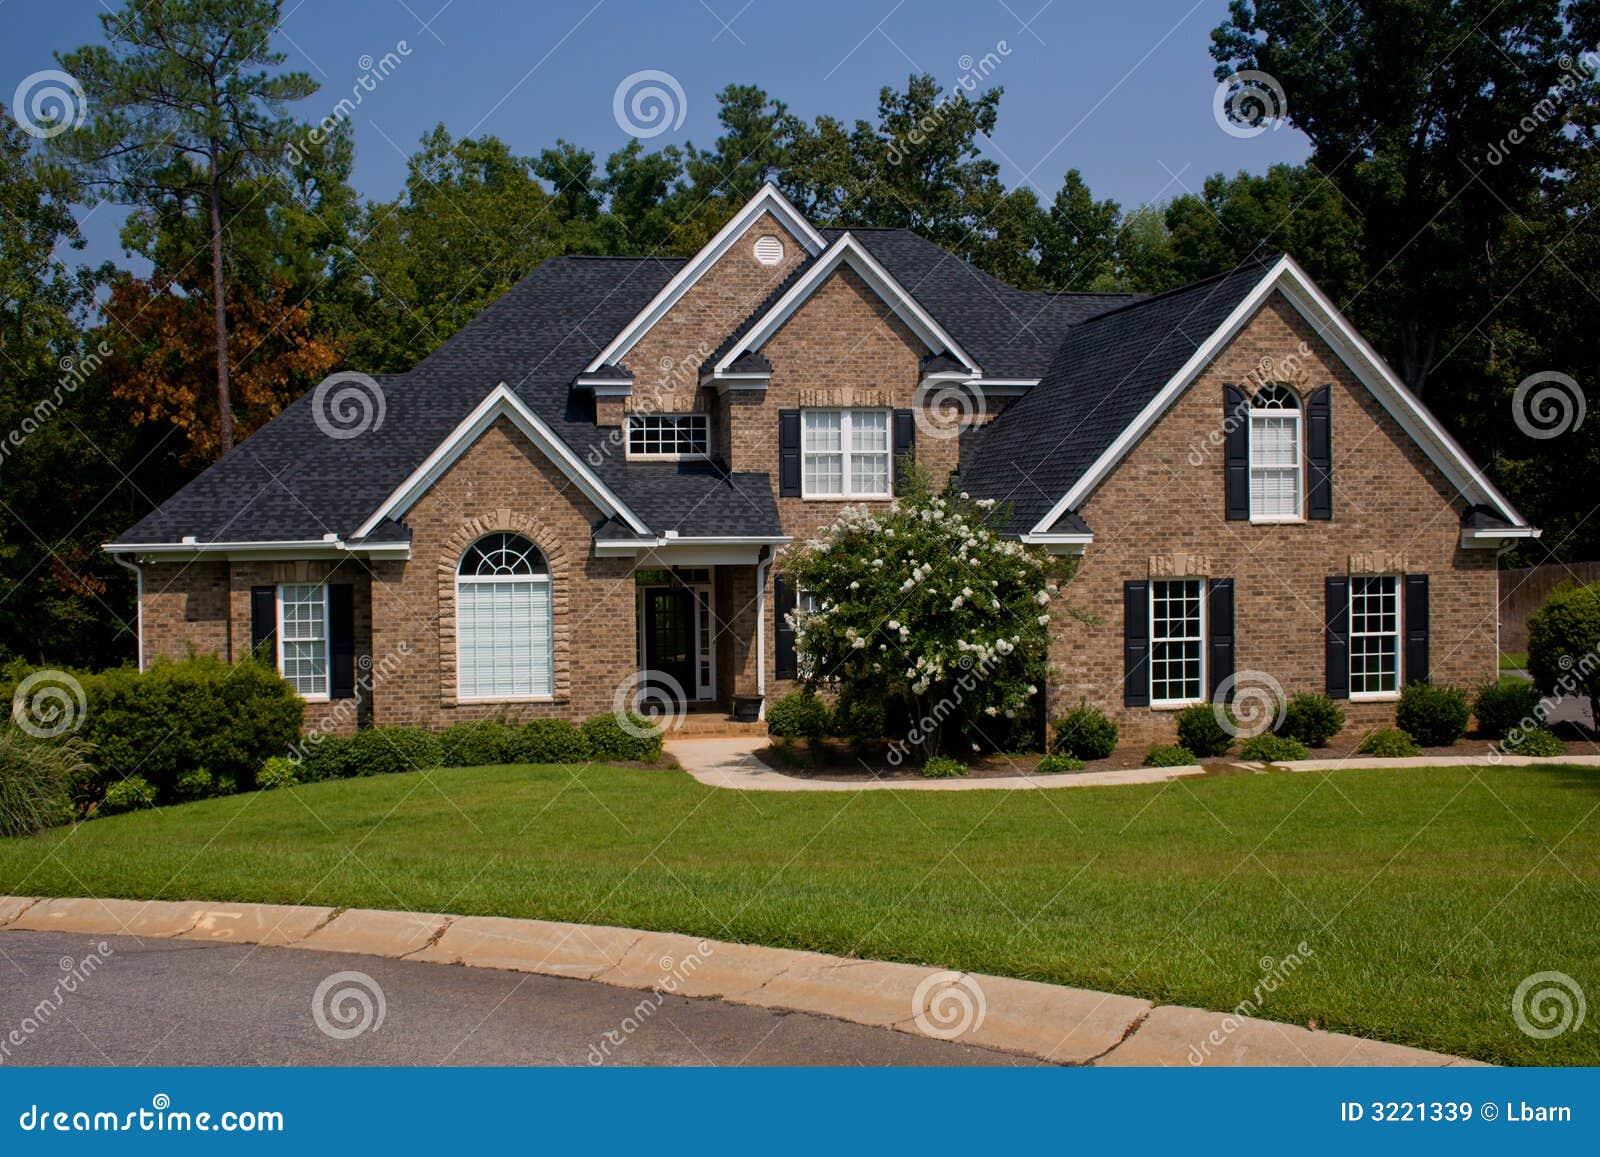 Custom Brick Home Royalty Free Stock Images - Image: 3221339